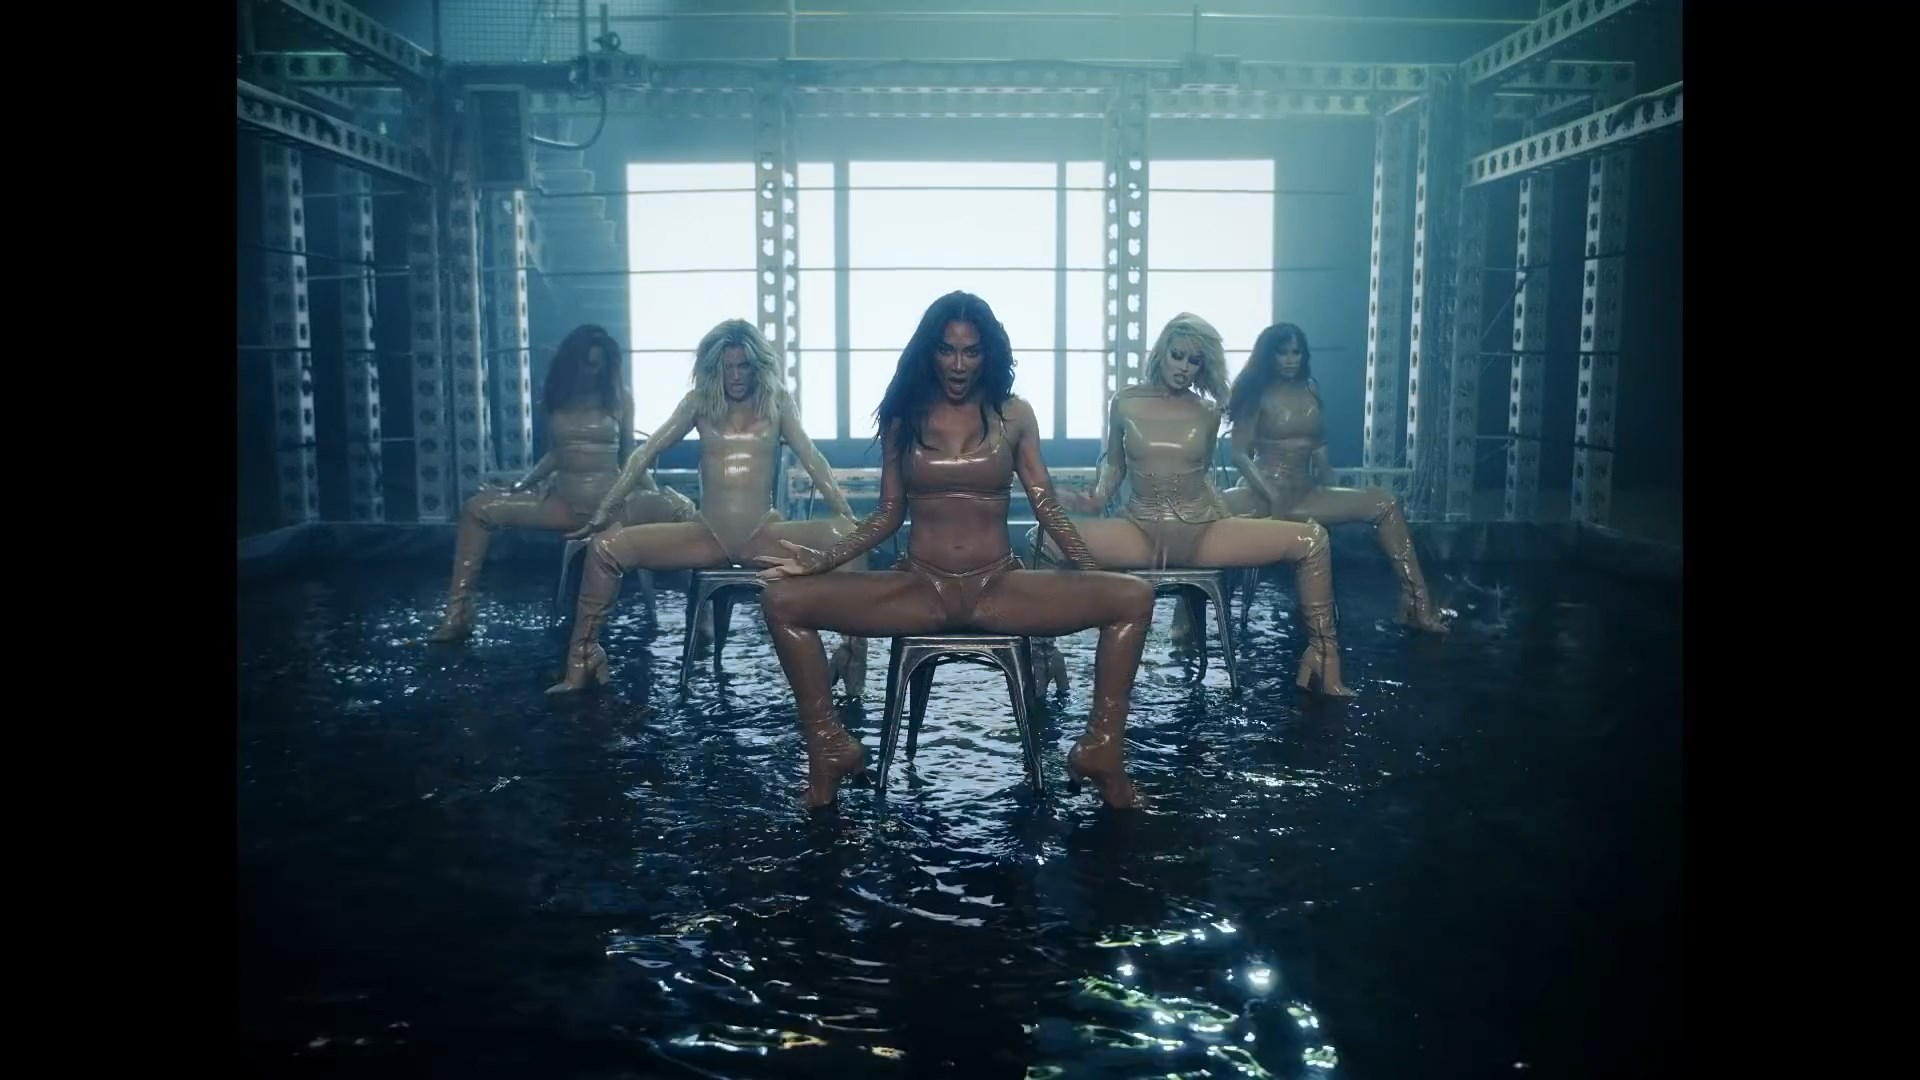 The Pussycat Dolls - React.mp4_snapshot_03.02_[2020.02.10_03.44.36].jpg